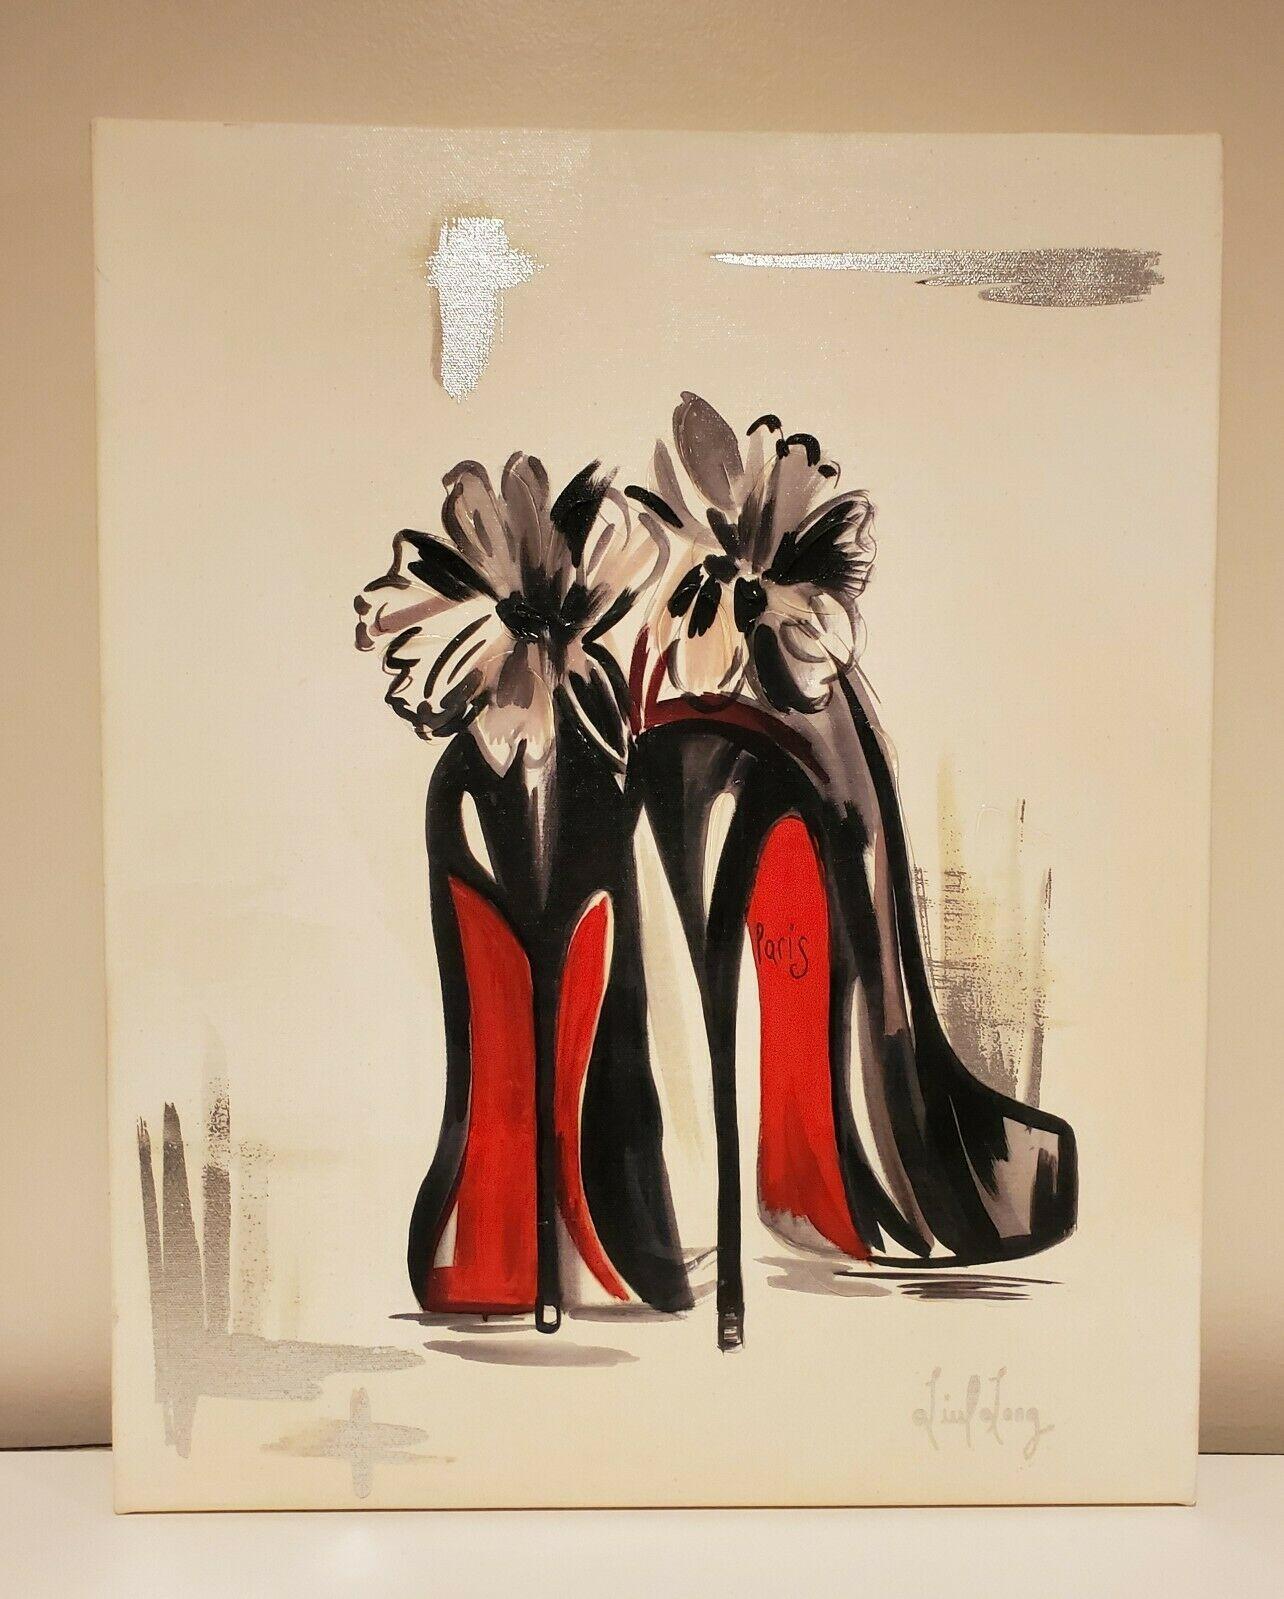 Fashion art rose champagne designer shoe lipstick beauty room Art